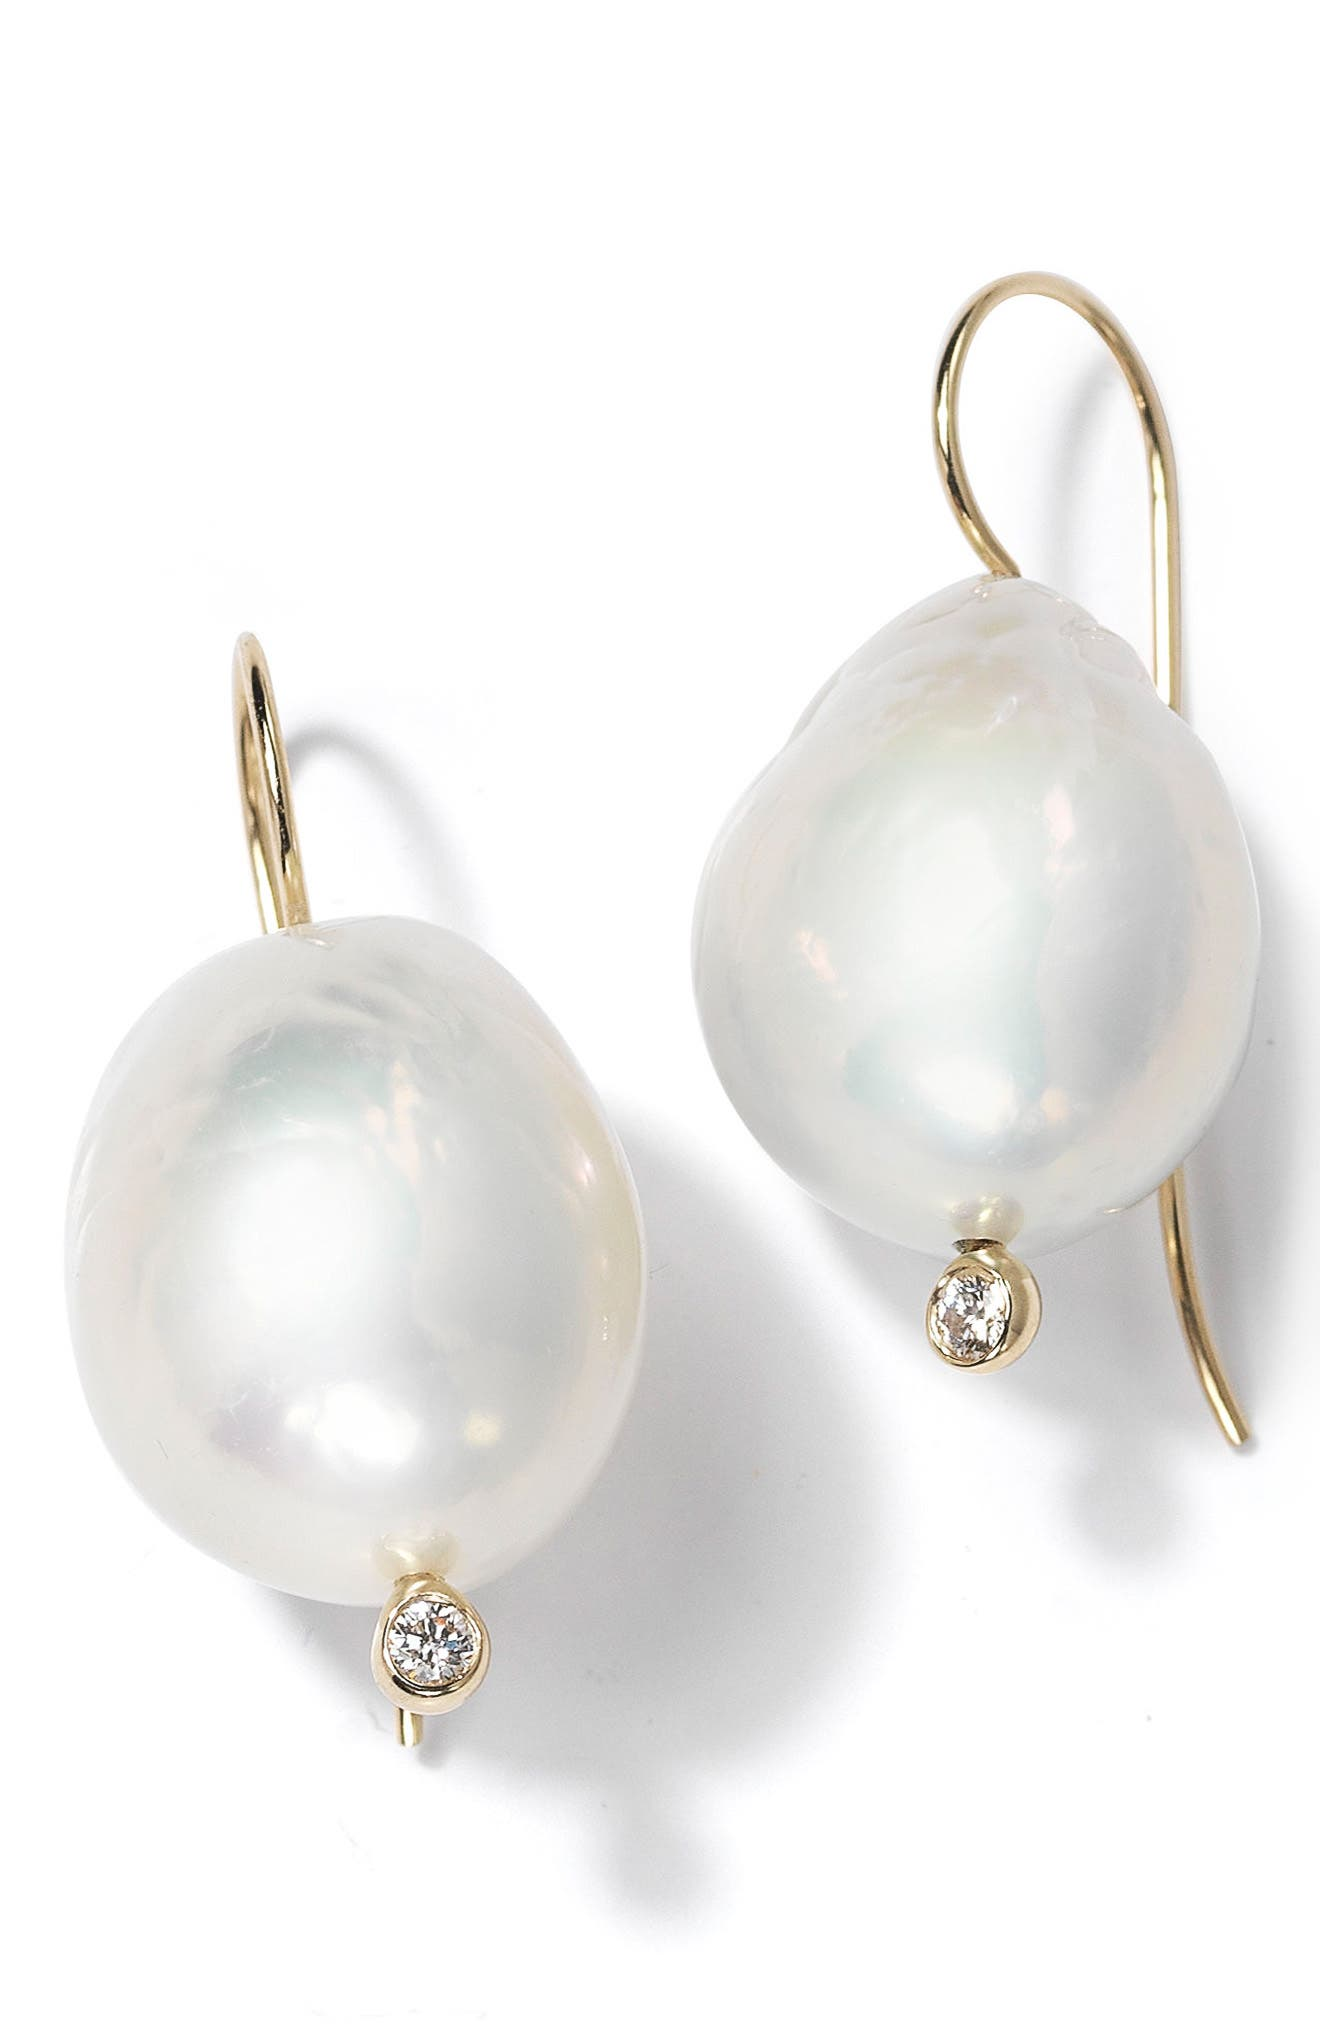 Large Baroque Pearl Drop Earrings,                             Main thumbnail 1, color,                             710